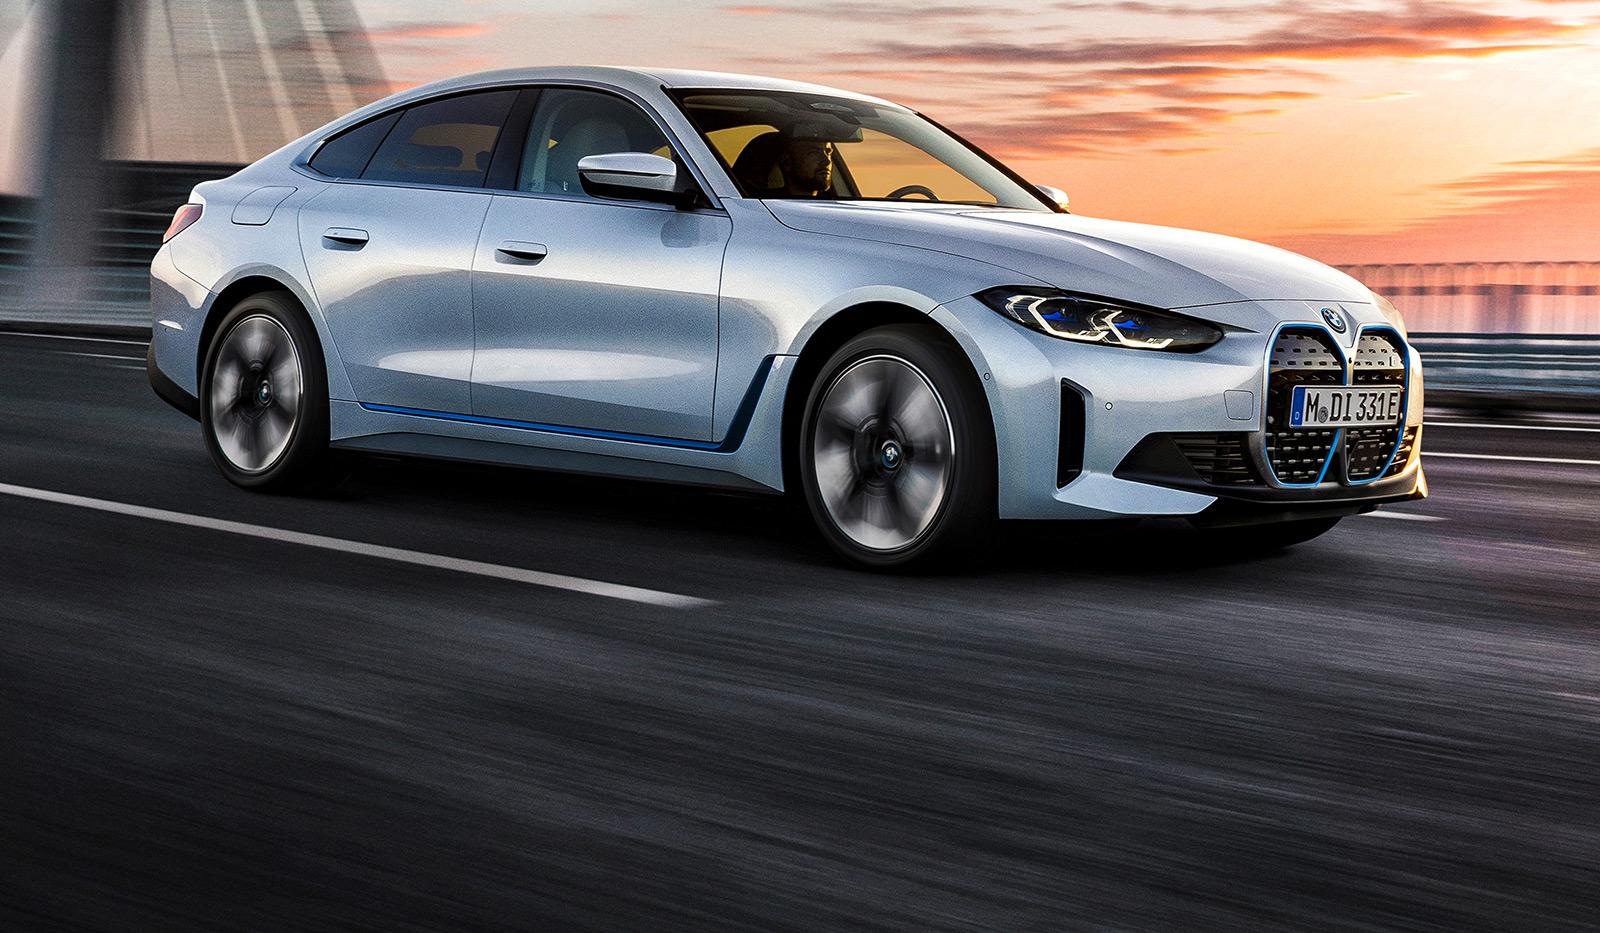 bmw i4 edrive4 - BMW i4 – Freude am Fahren